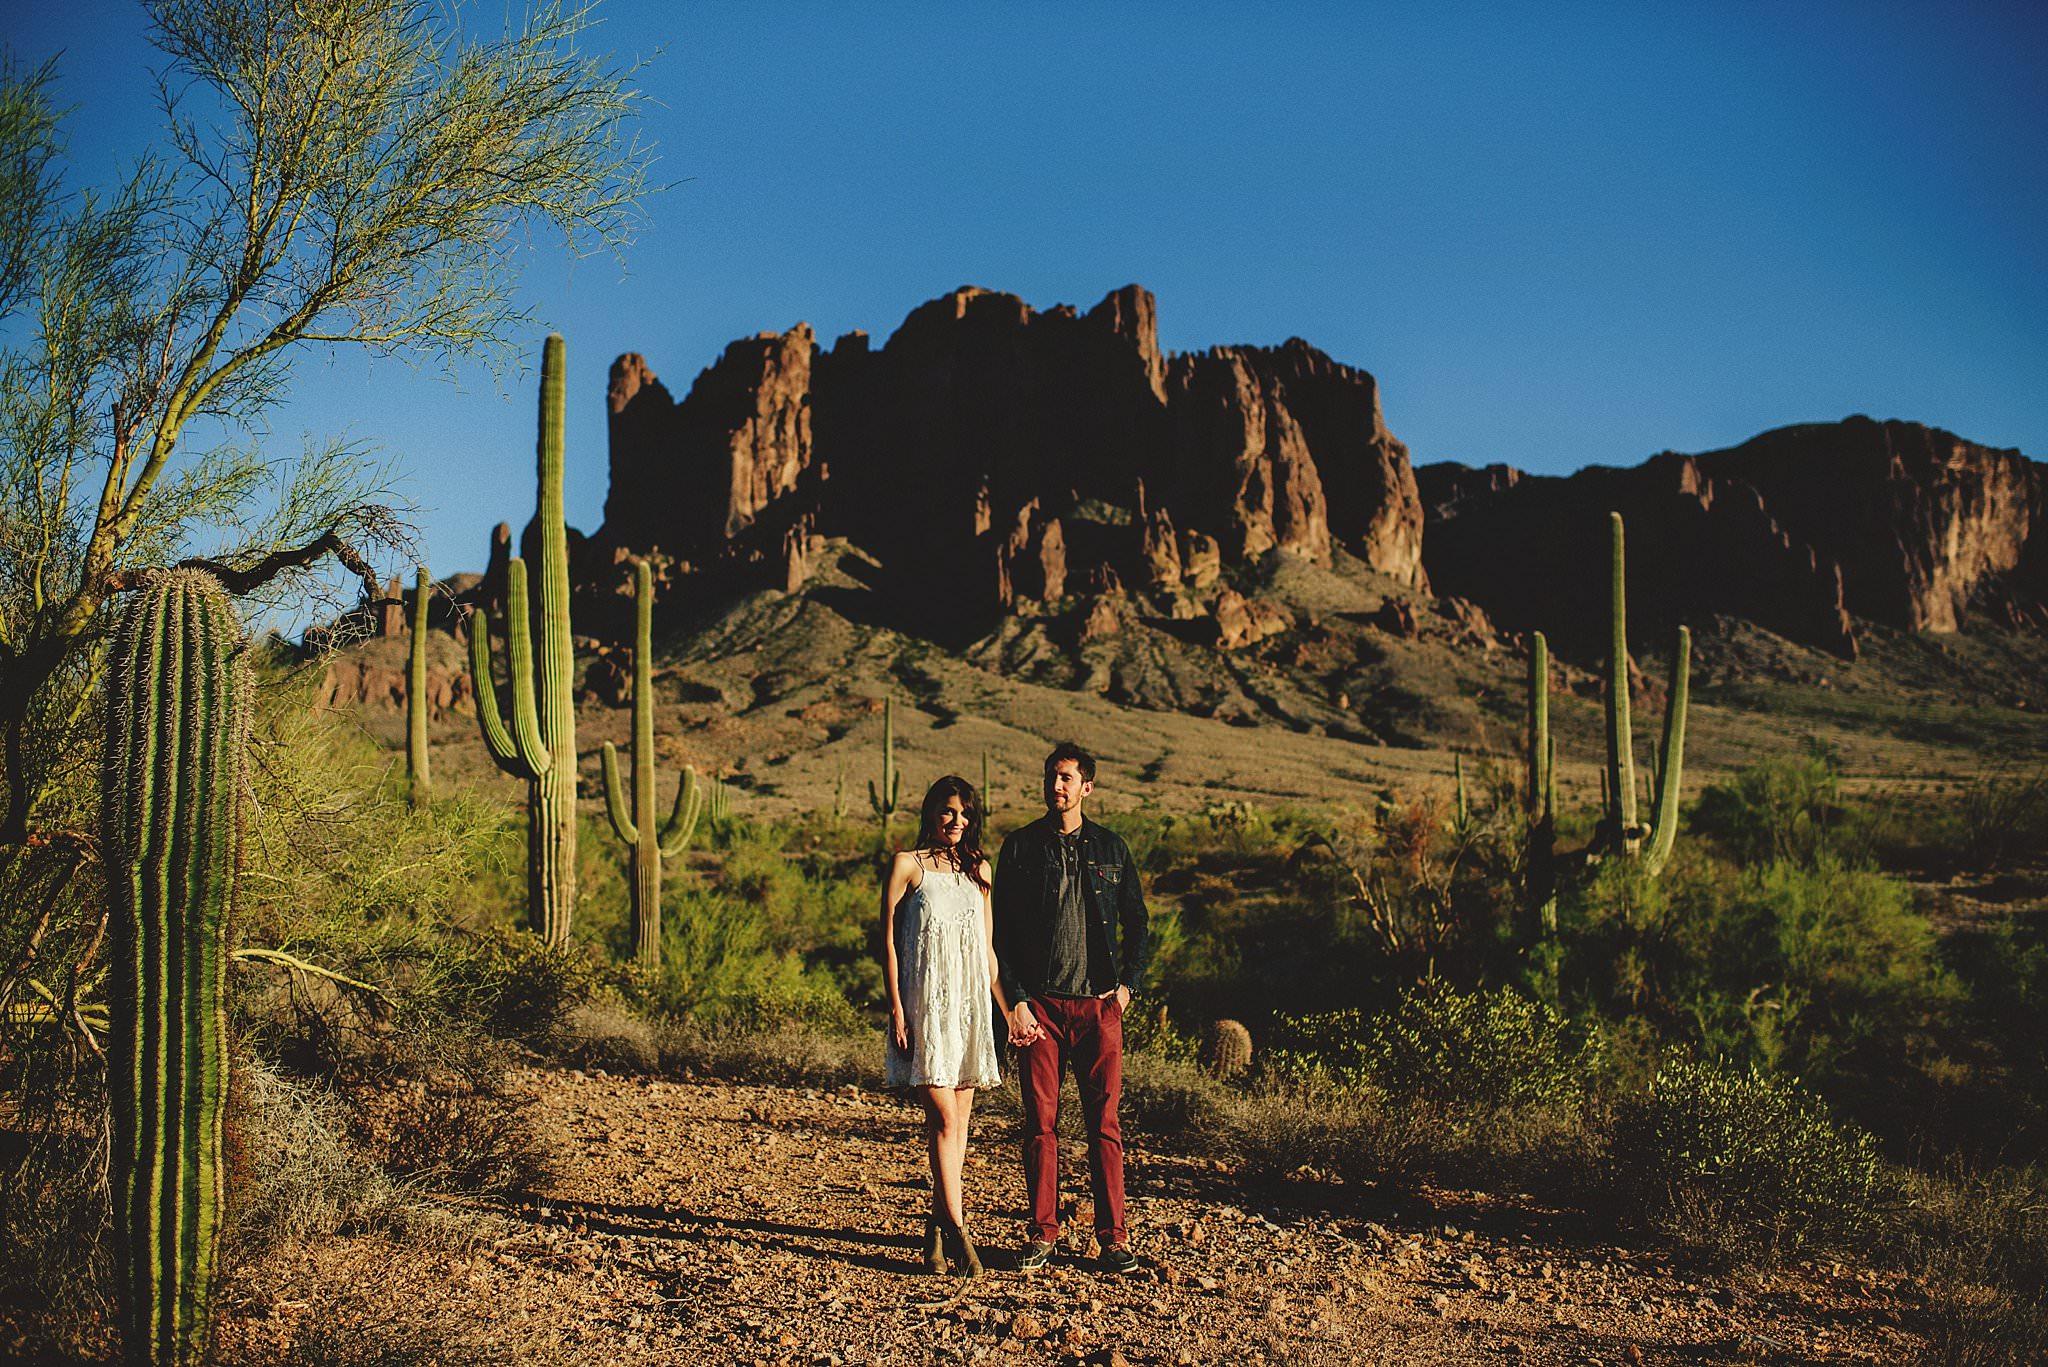 superstition-mountains-desert-engagement-photos-0009.jpg